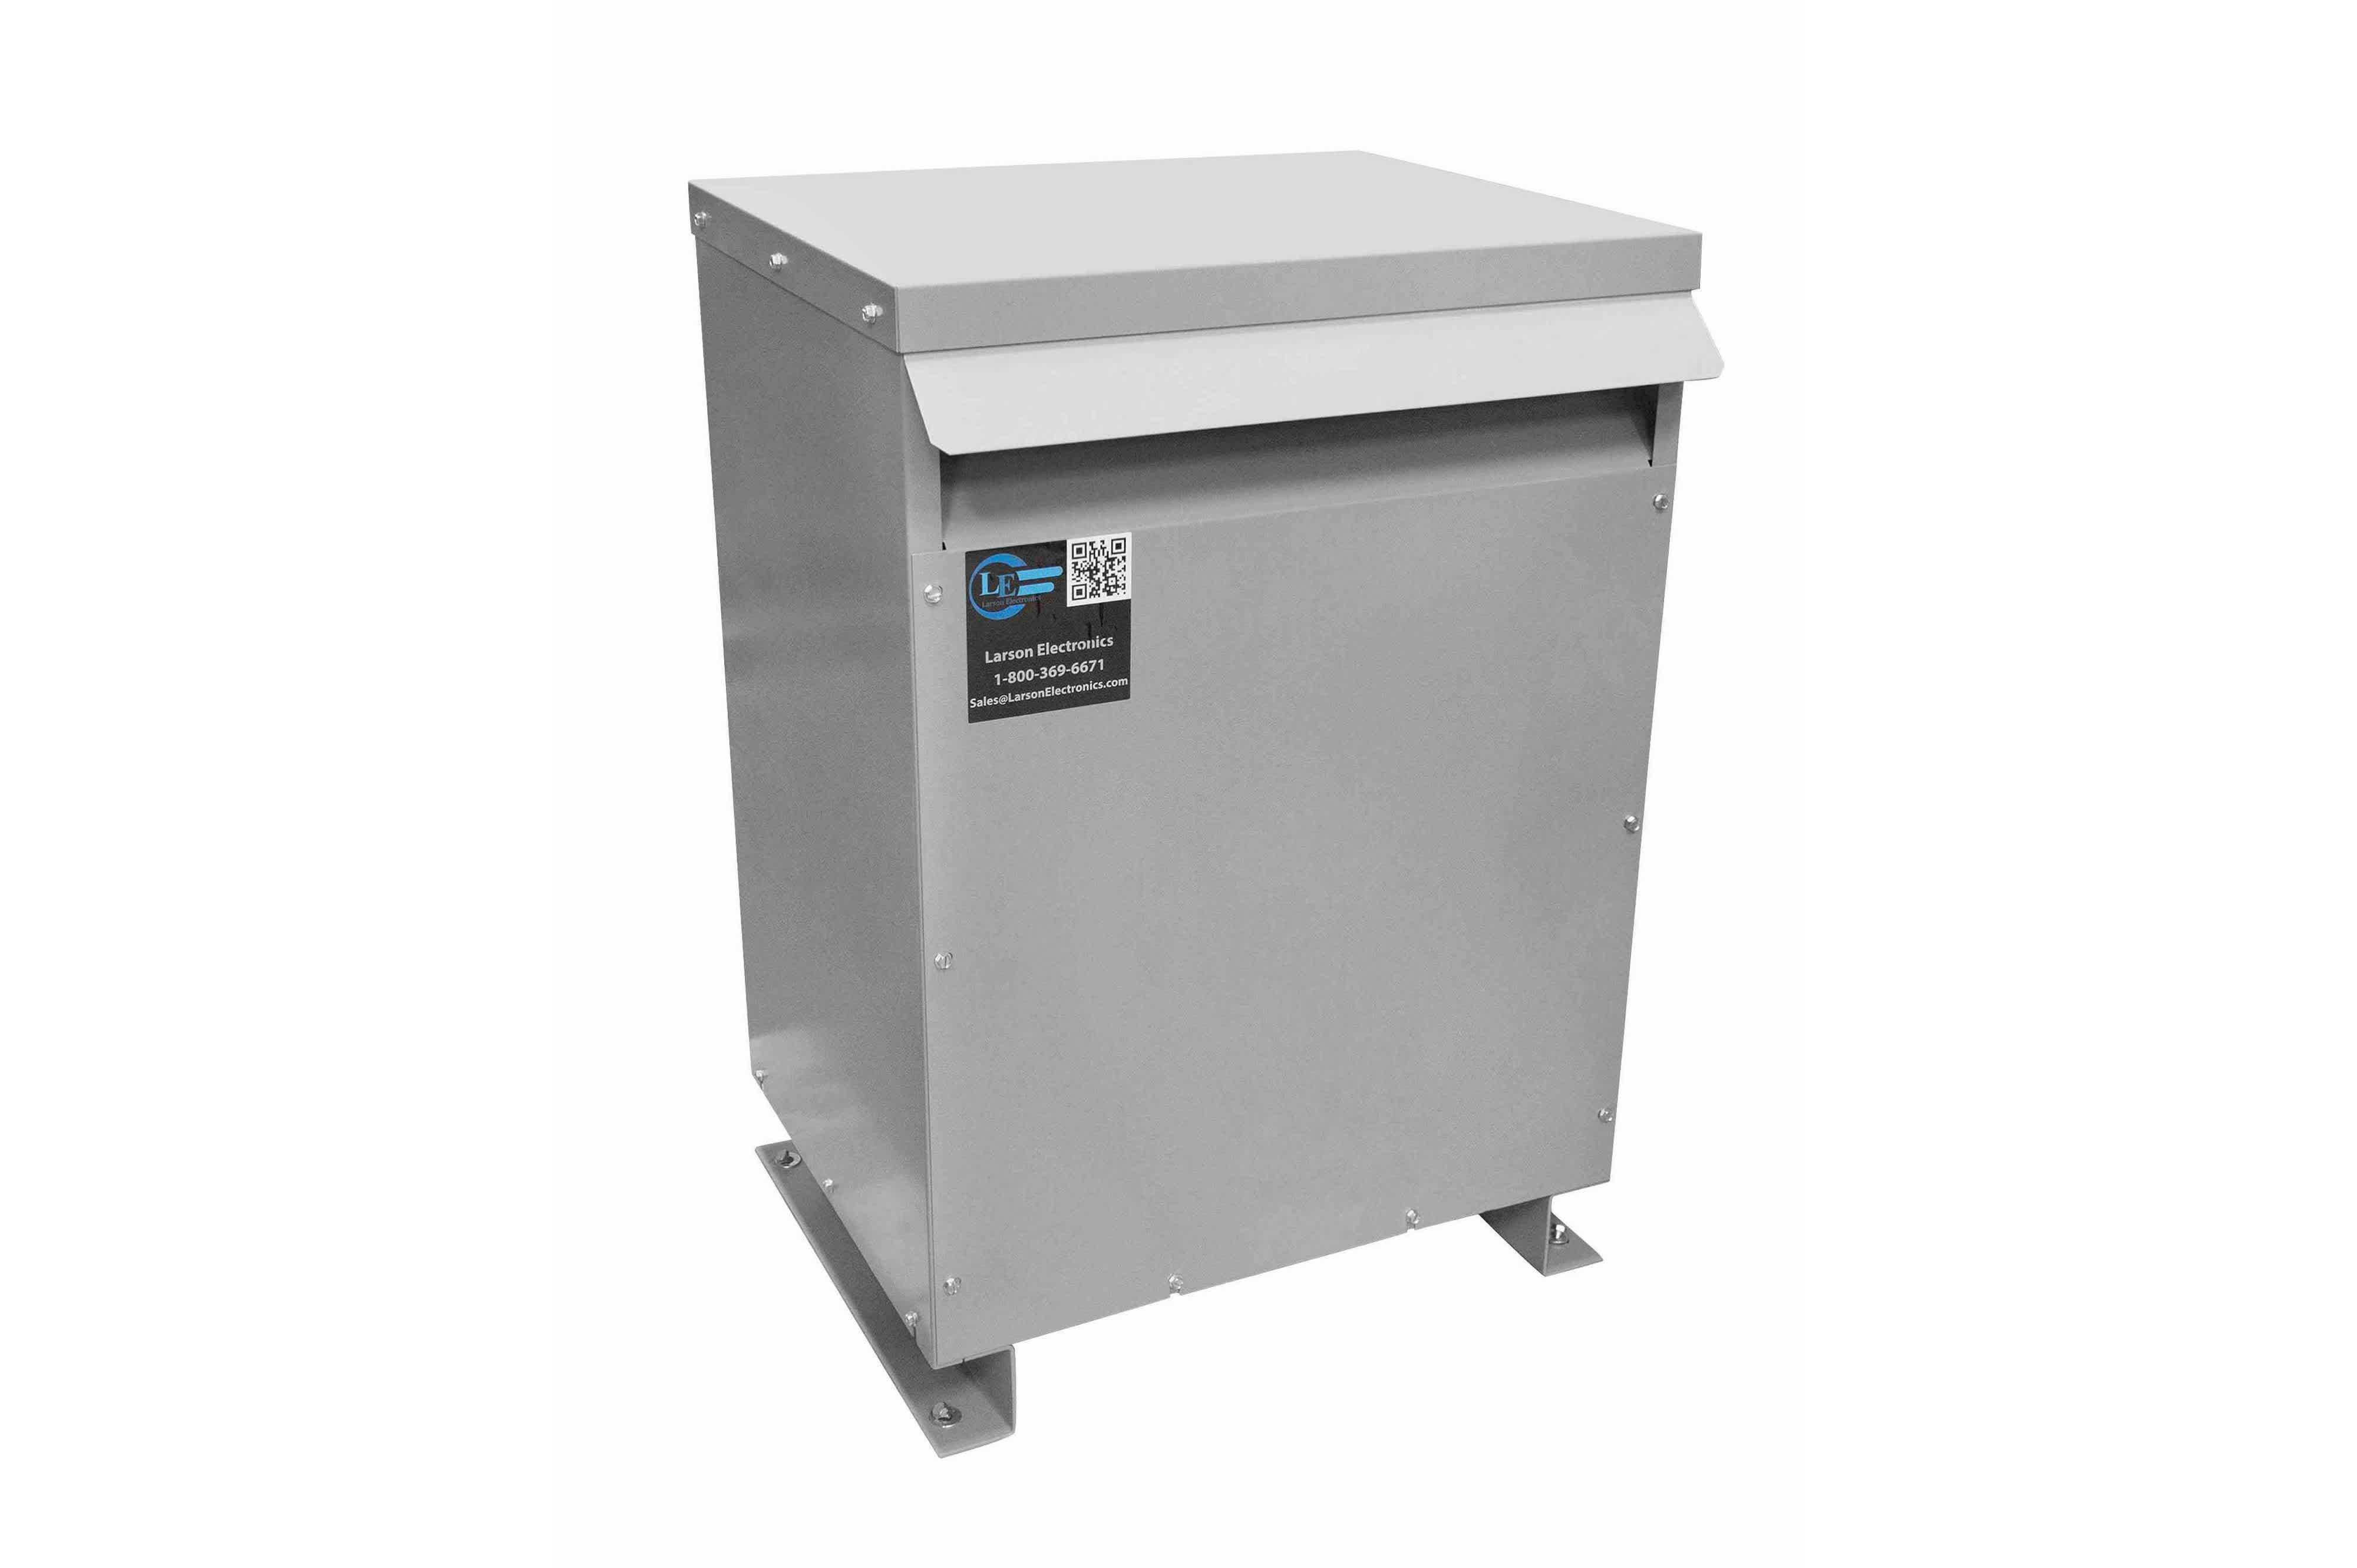 110 kVA 3PH Isolation Transformer, 240V Wye Primary, 600Y/347 Wye-N Secondary, N3R, Ventilated, 60 Hz